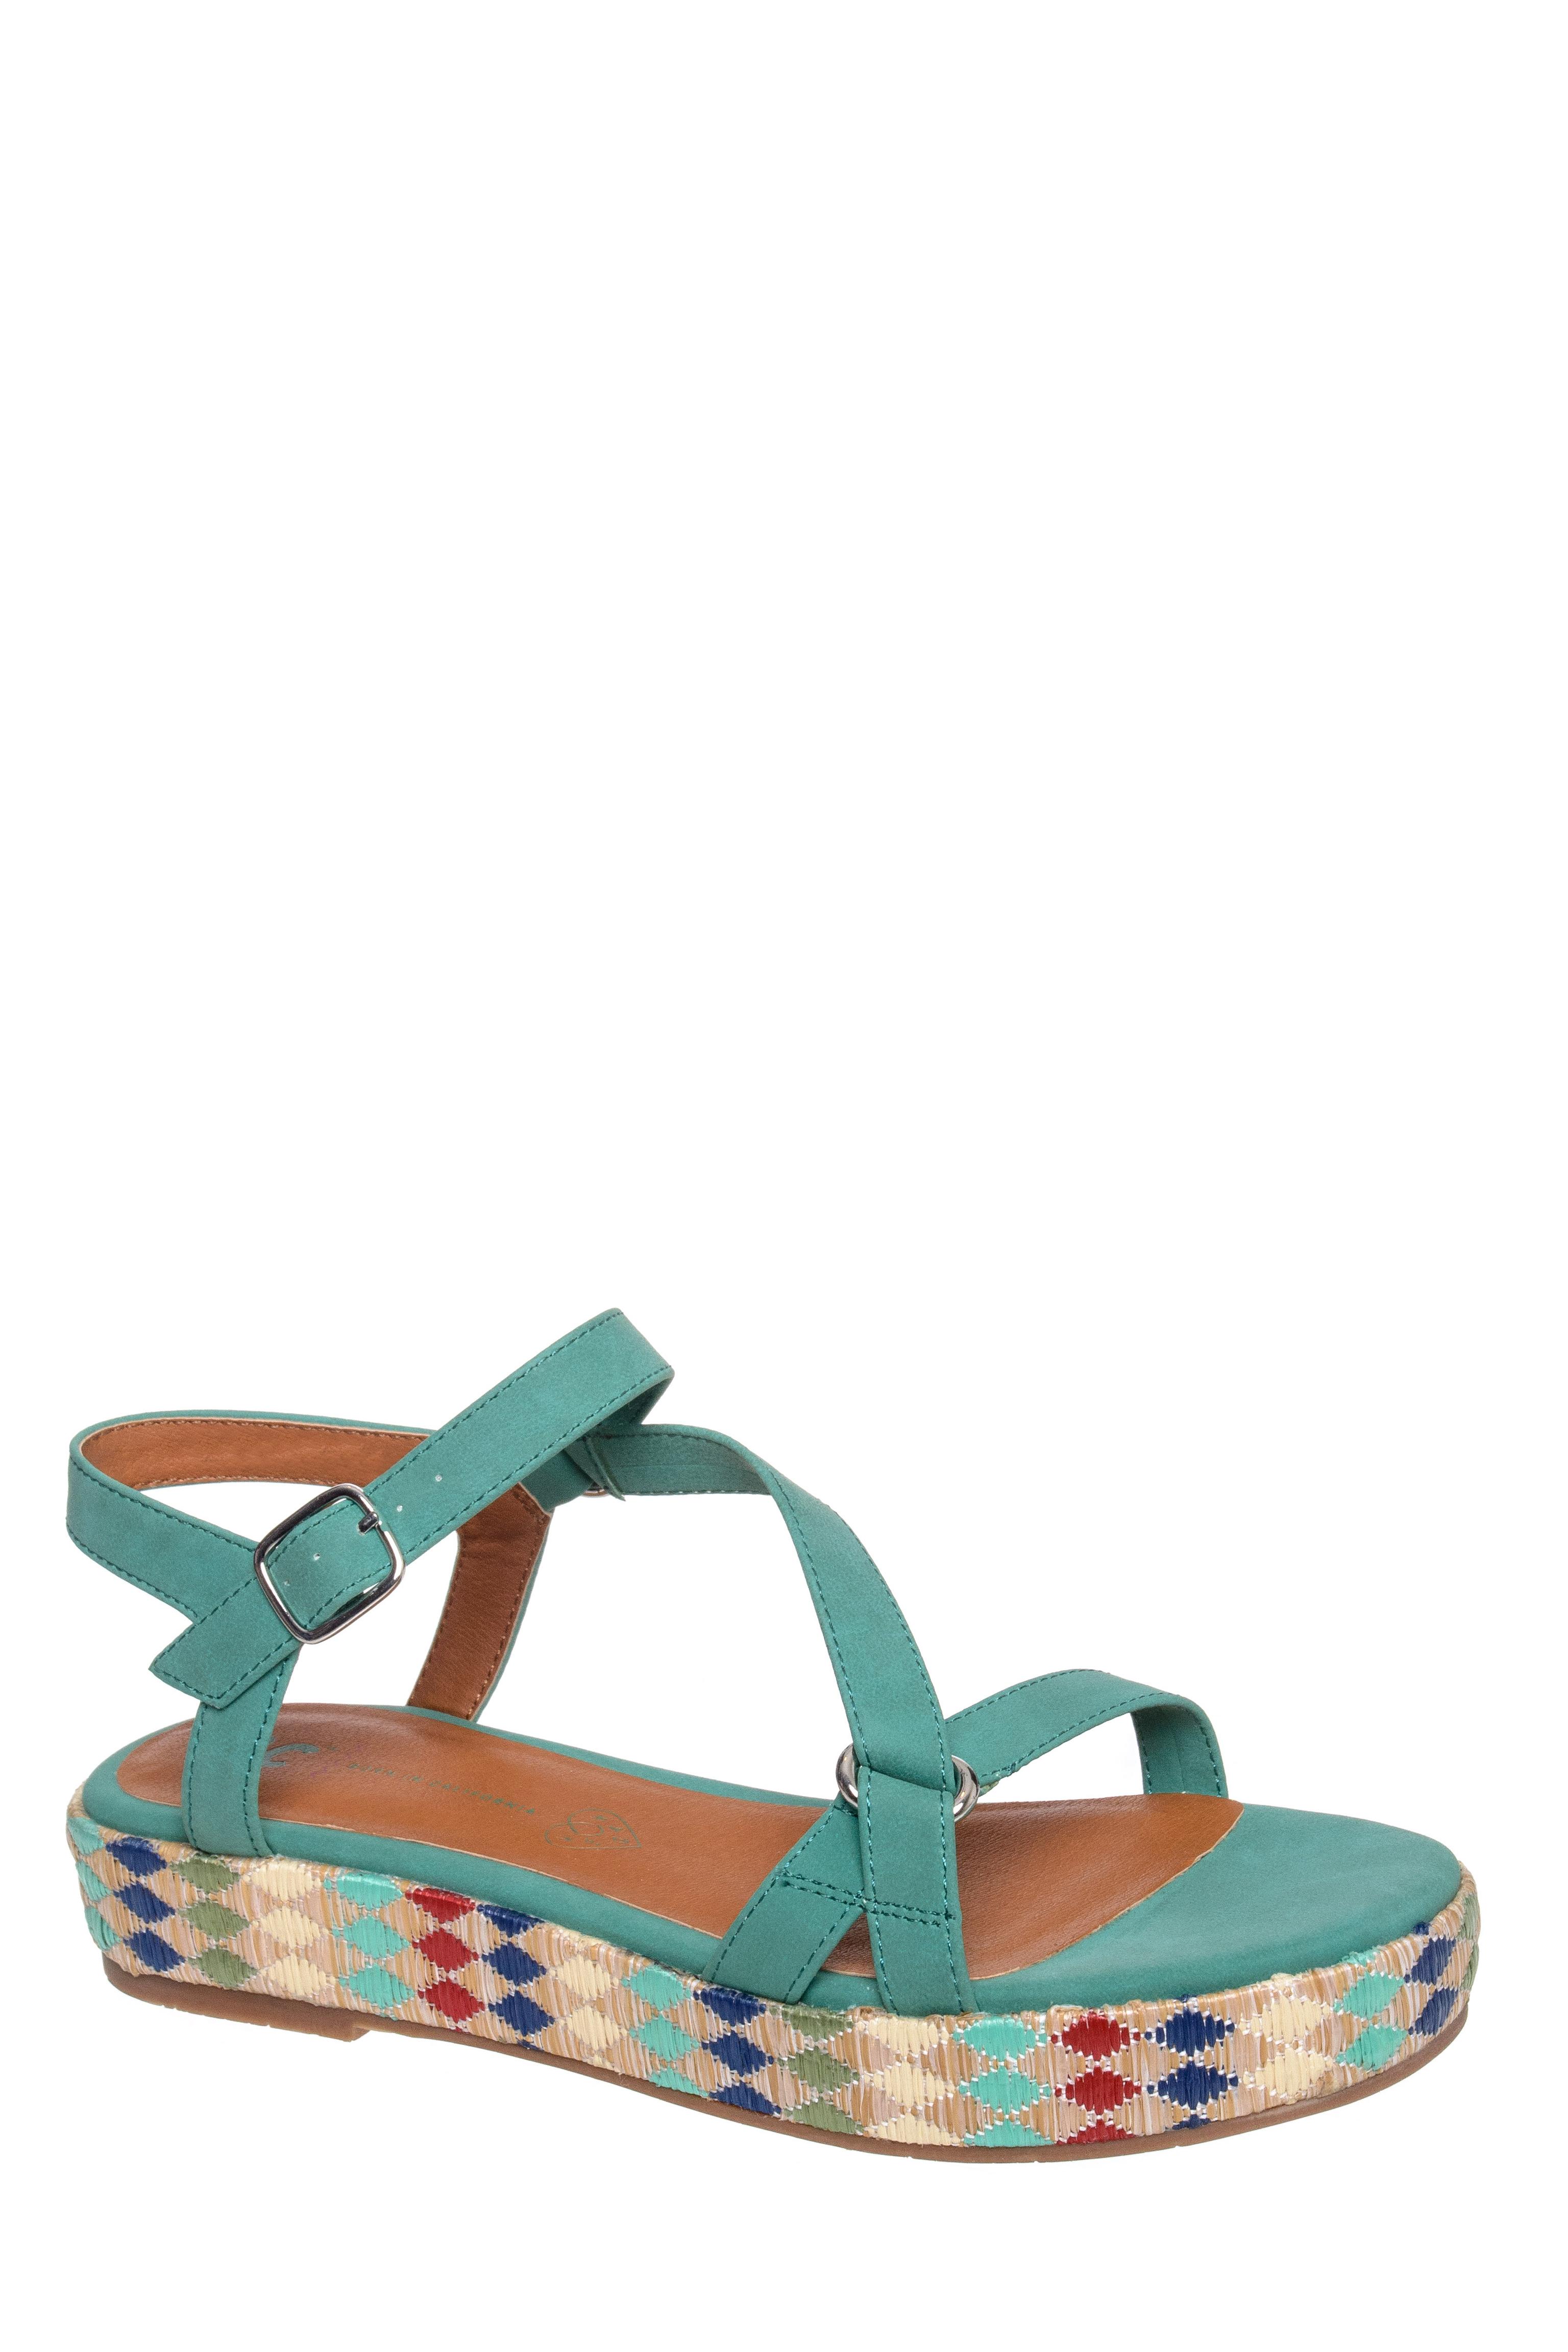 BC Footwear Tuxedo Low Platform Flats Sandals - Green